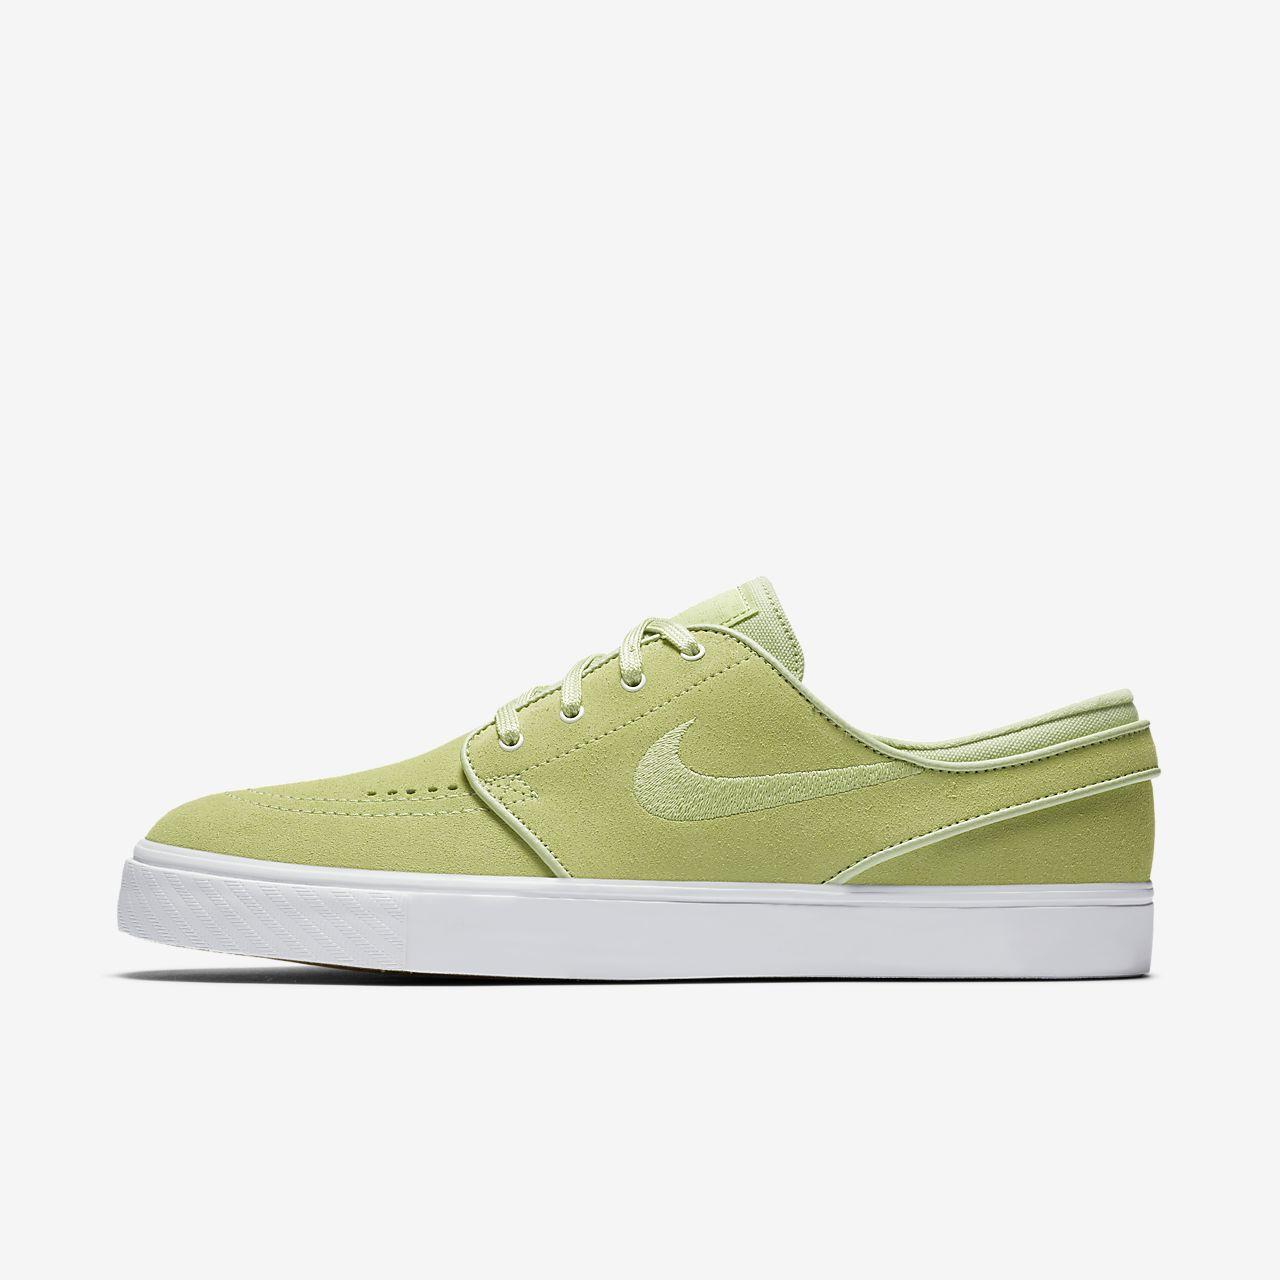 Nike Zoom Stefan Janoski Herren-Skateboardschuh